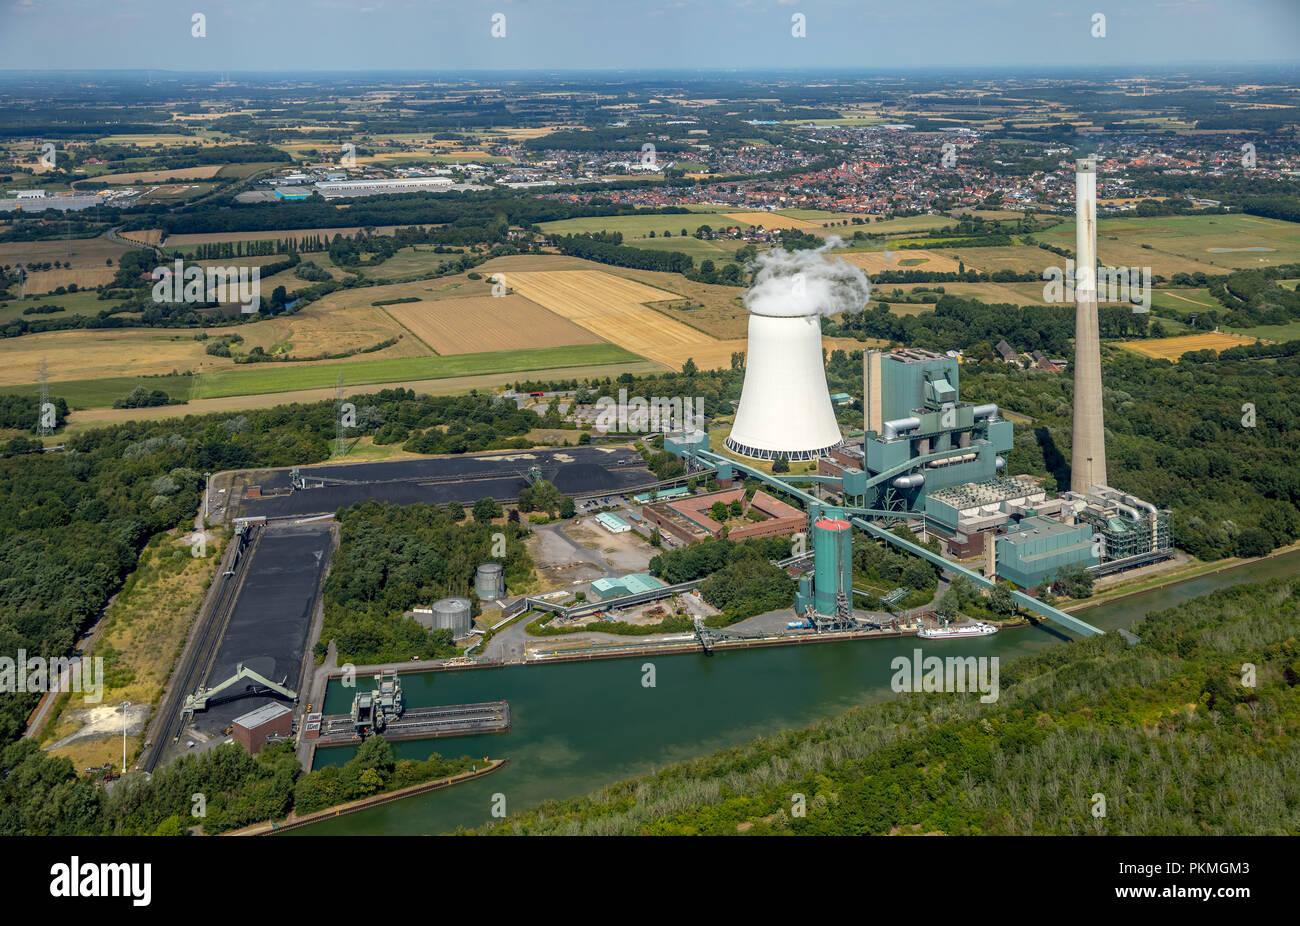 Aerial view, Power plant Heil, joint power station Bergkamen, Bergkamen, Ruhr Area, North Rhine-Westphalia, Germany - Stock Image